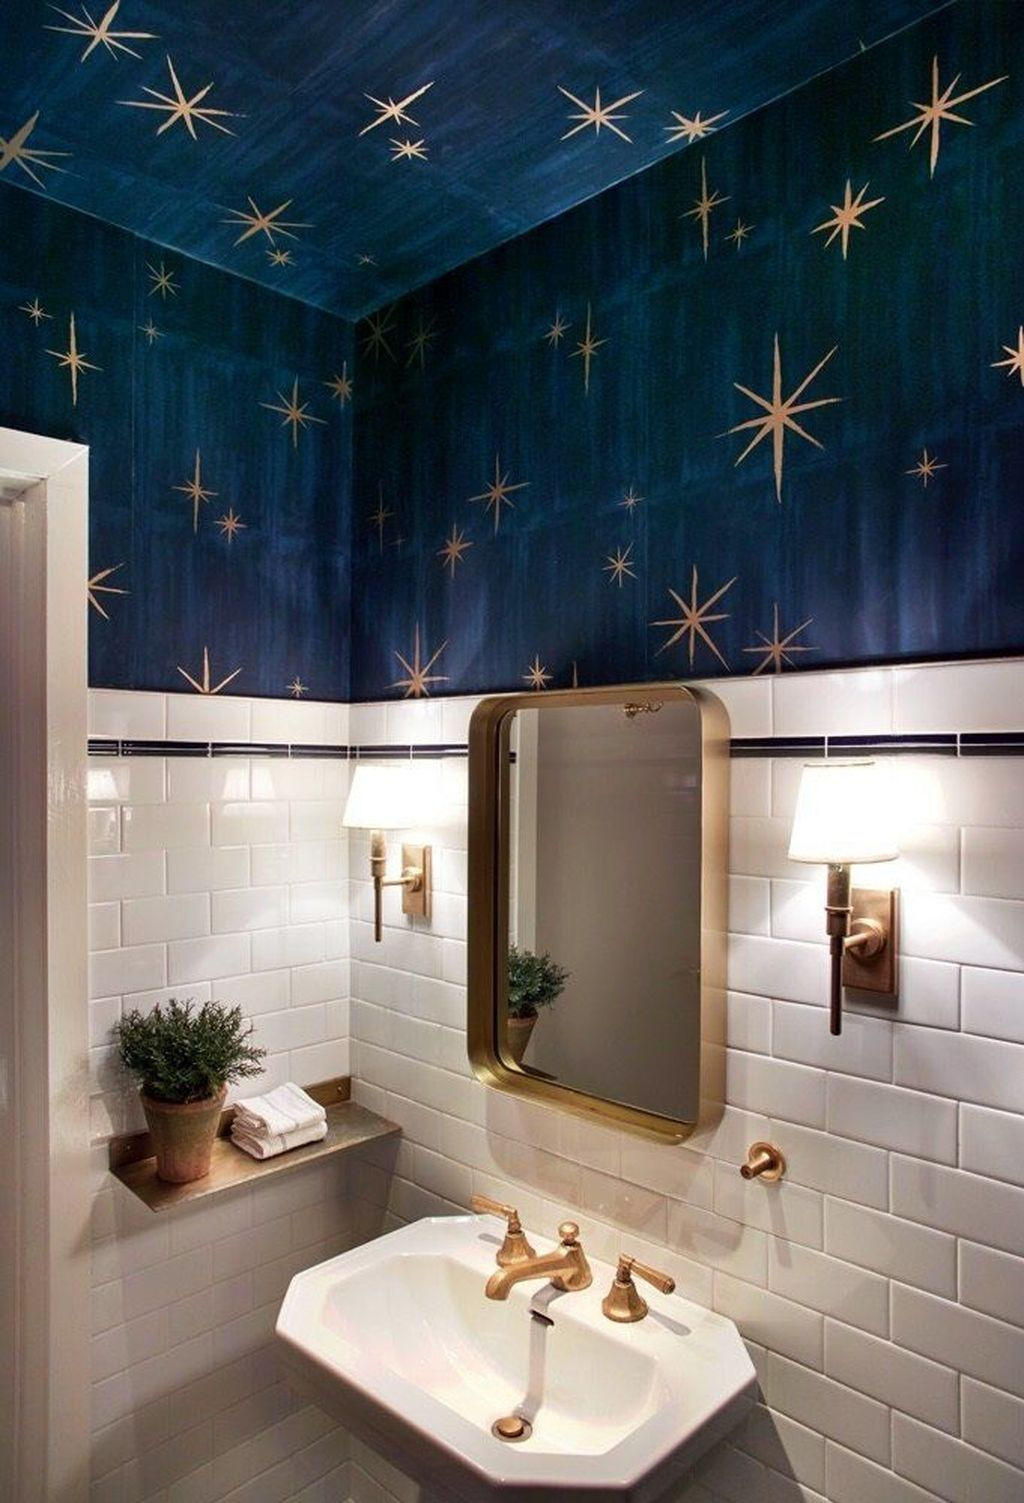 48 Popular Bathroom Wallpaper Ideas In 2020 Bathroom Wallpaper